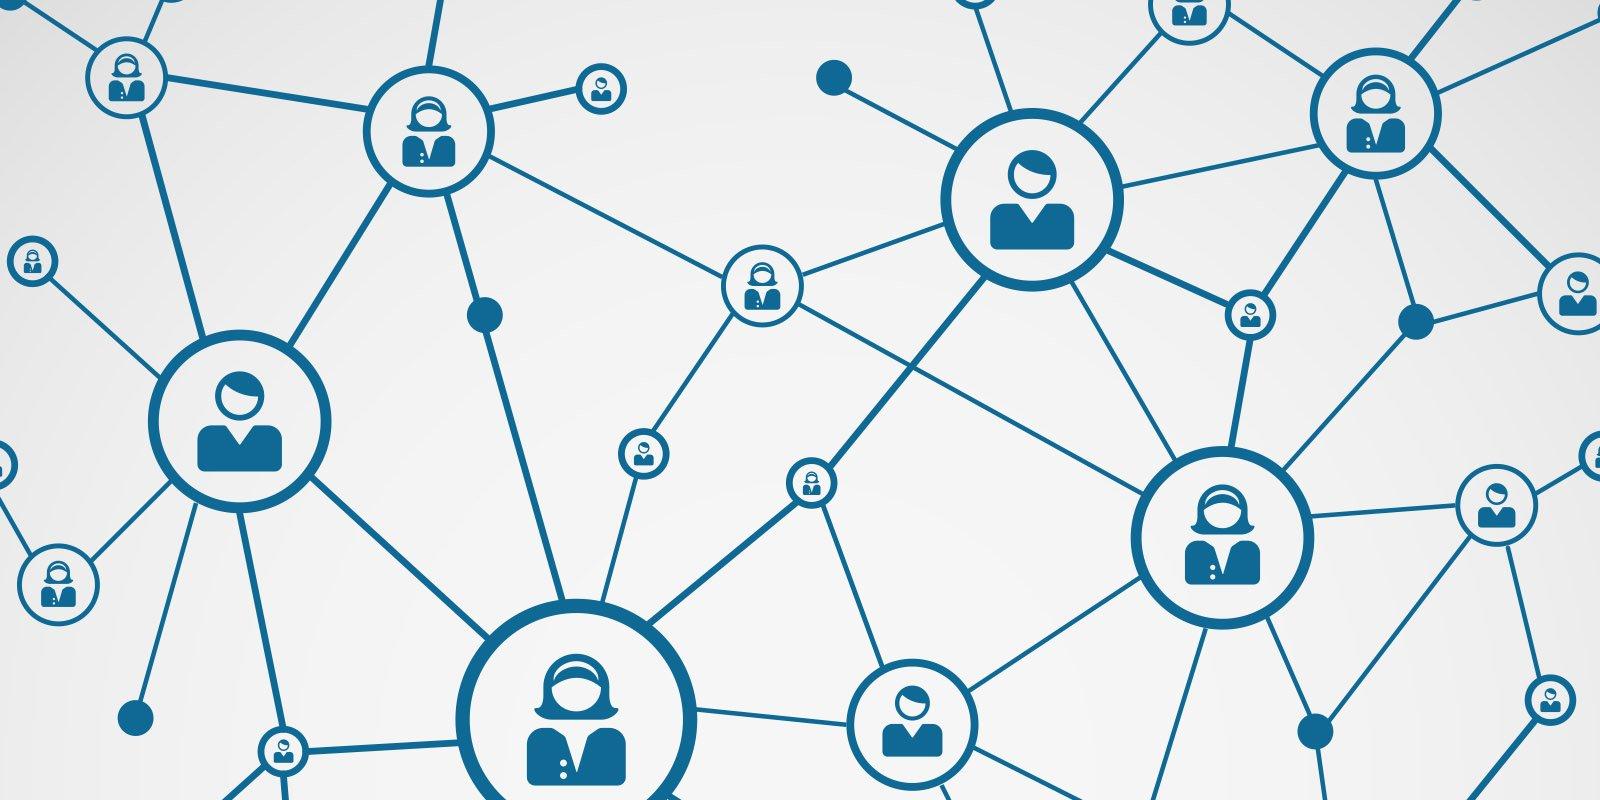 8 razones para hacer networking - Chez Space